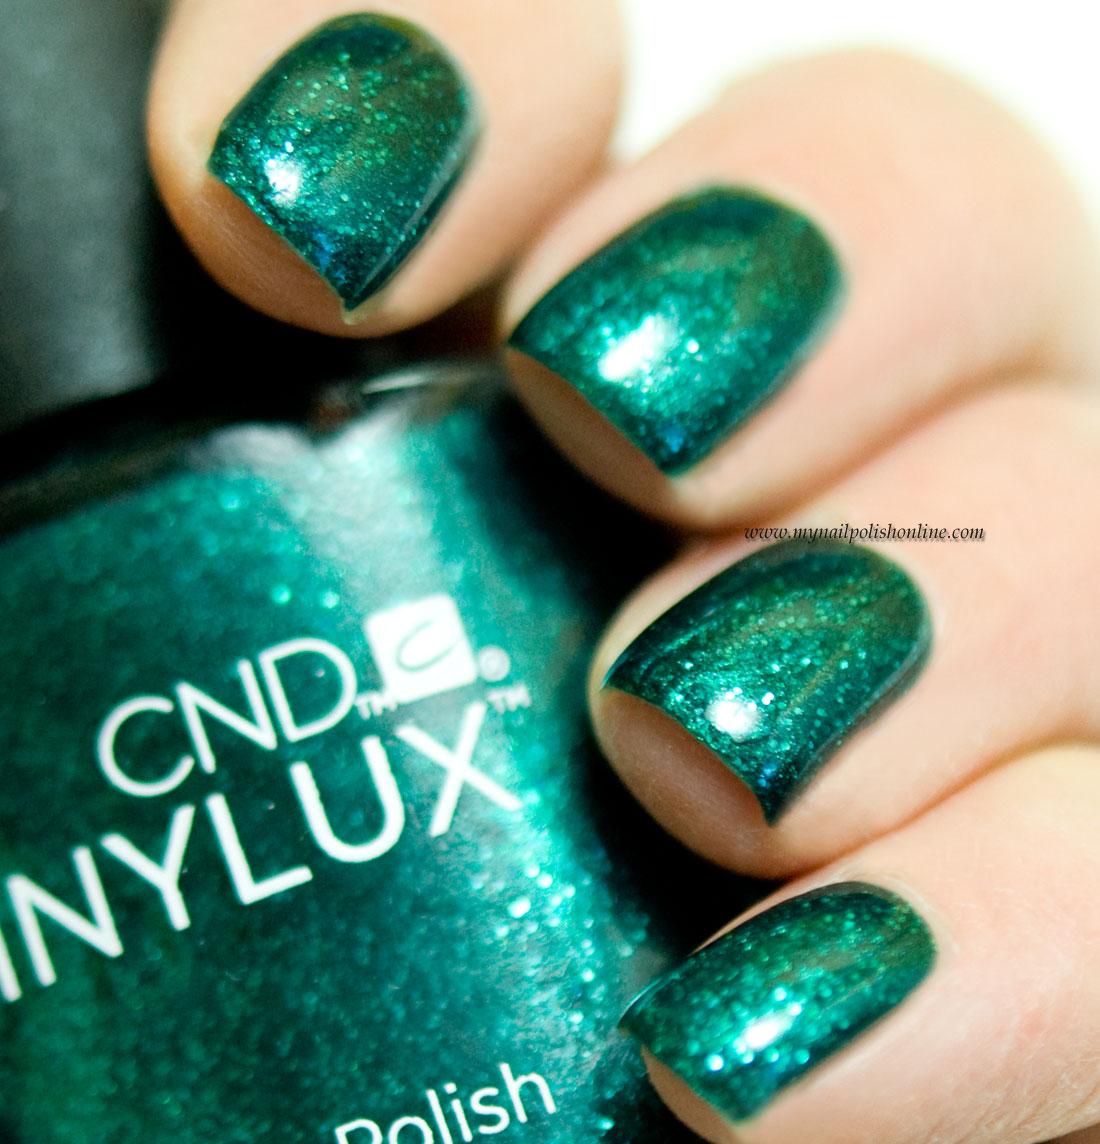 CND Vinylux - Emerald Lights